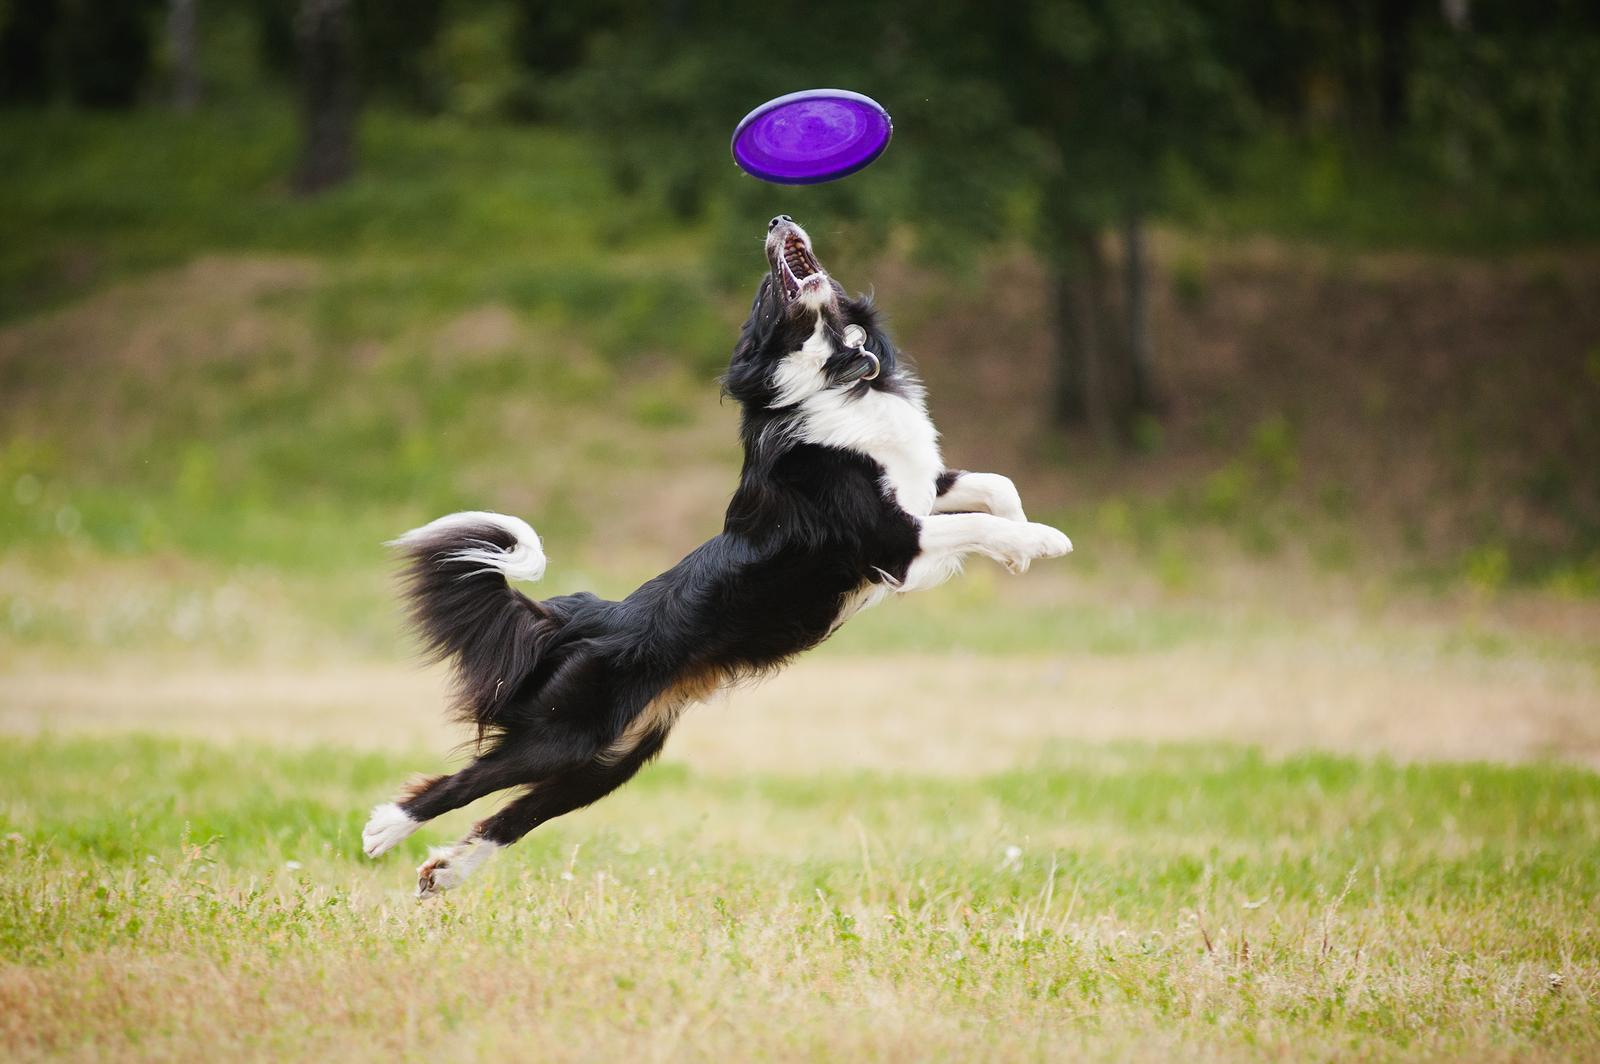 bigstock-Frisbee-dog-36722485.jpg